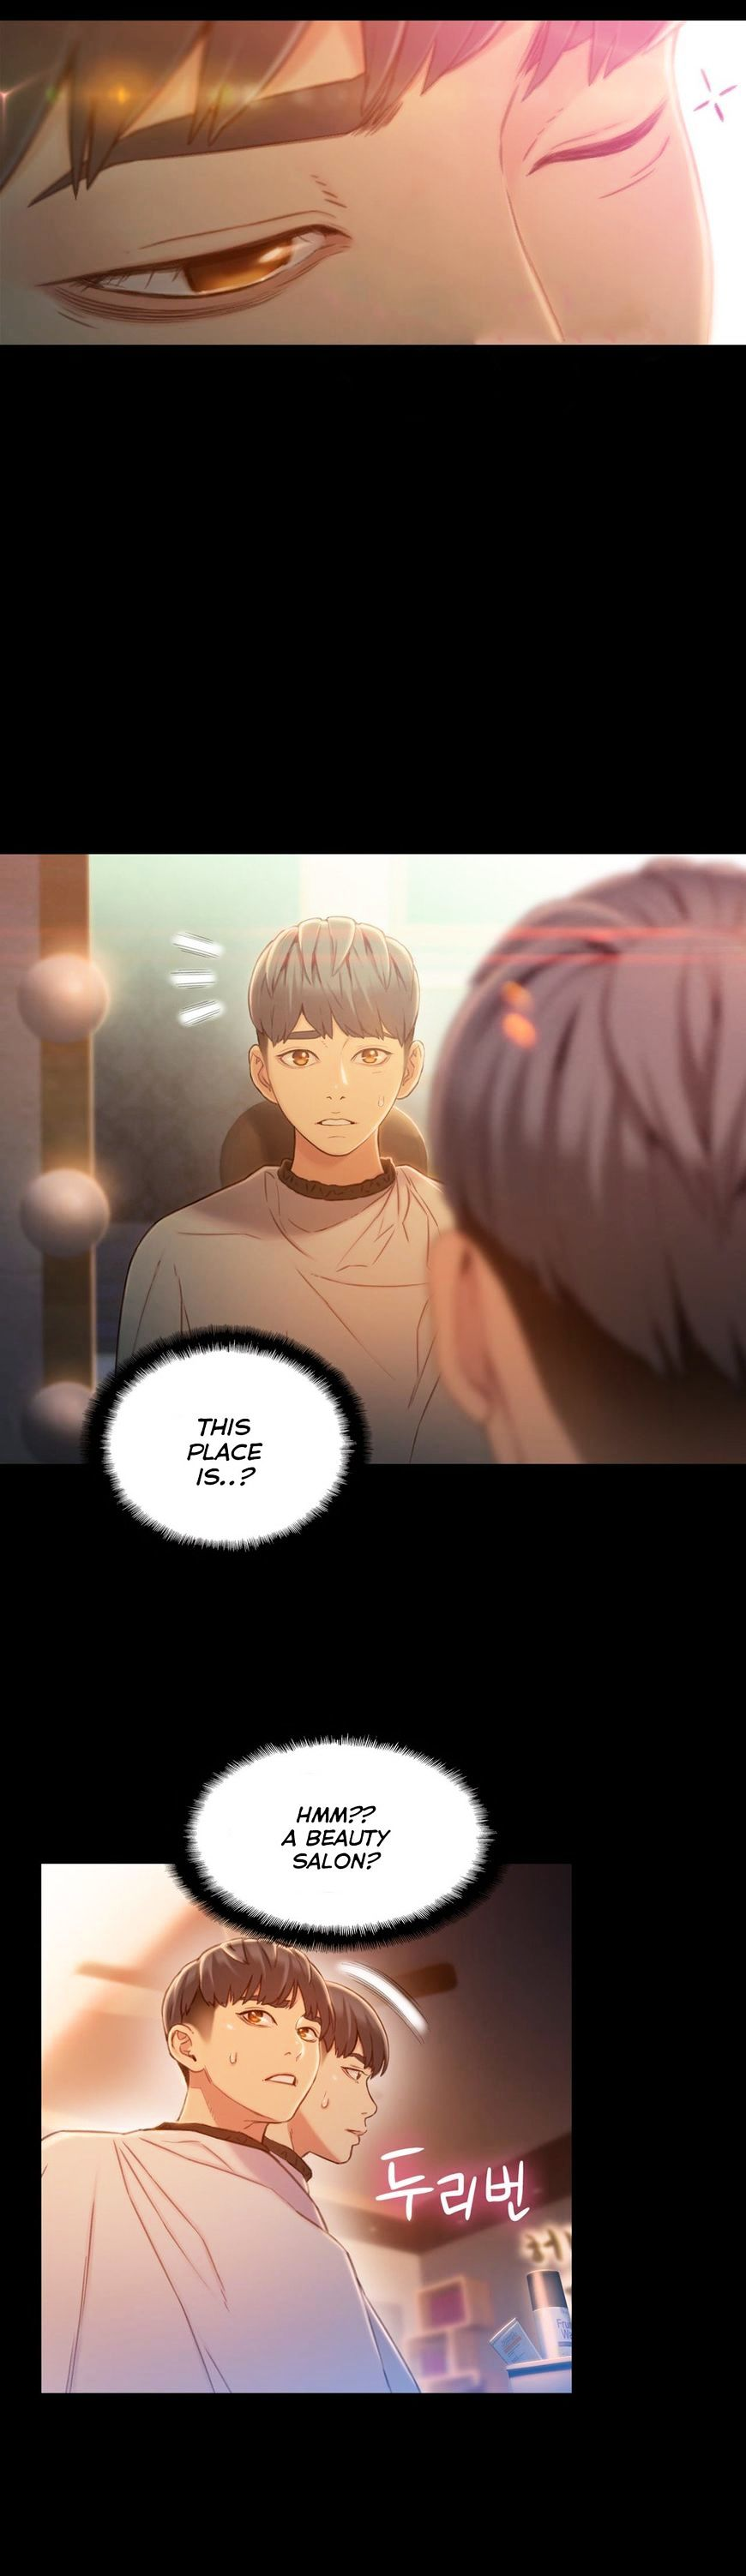 Sweet Guy Chapter 74 Full Manga Read Scan Image 3